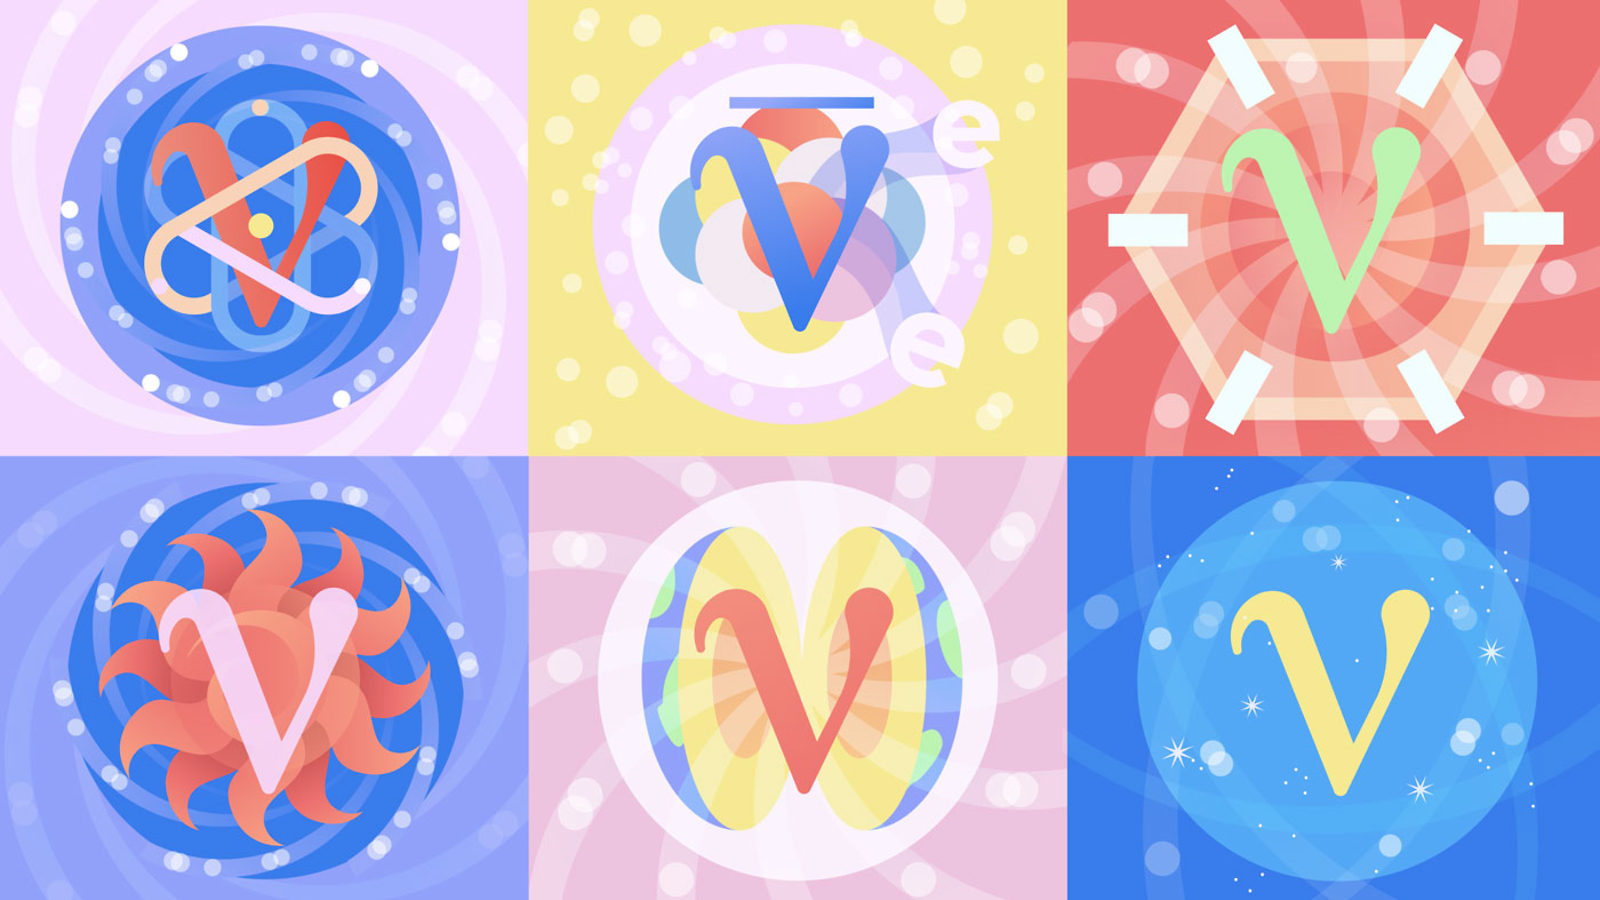 Illustration of Neutrino Experiments